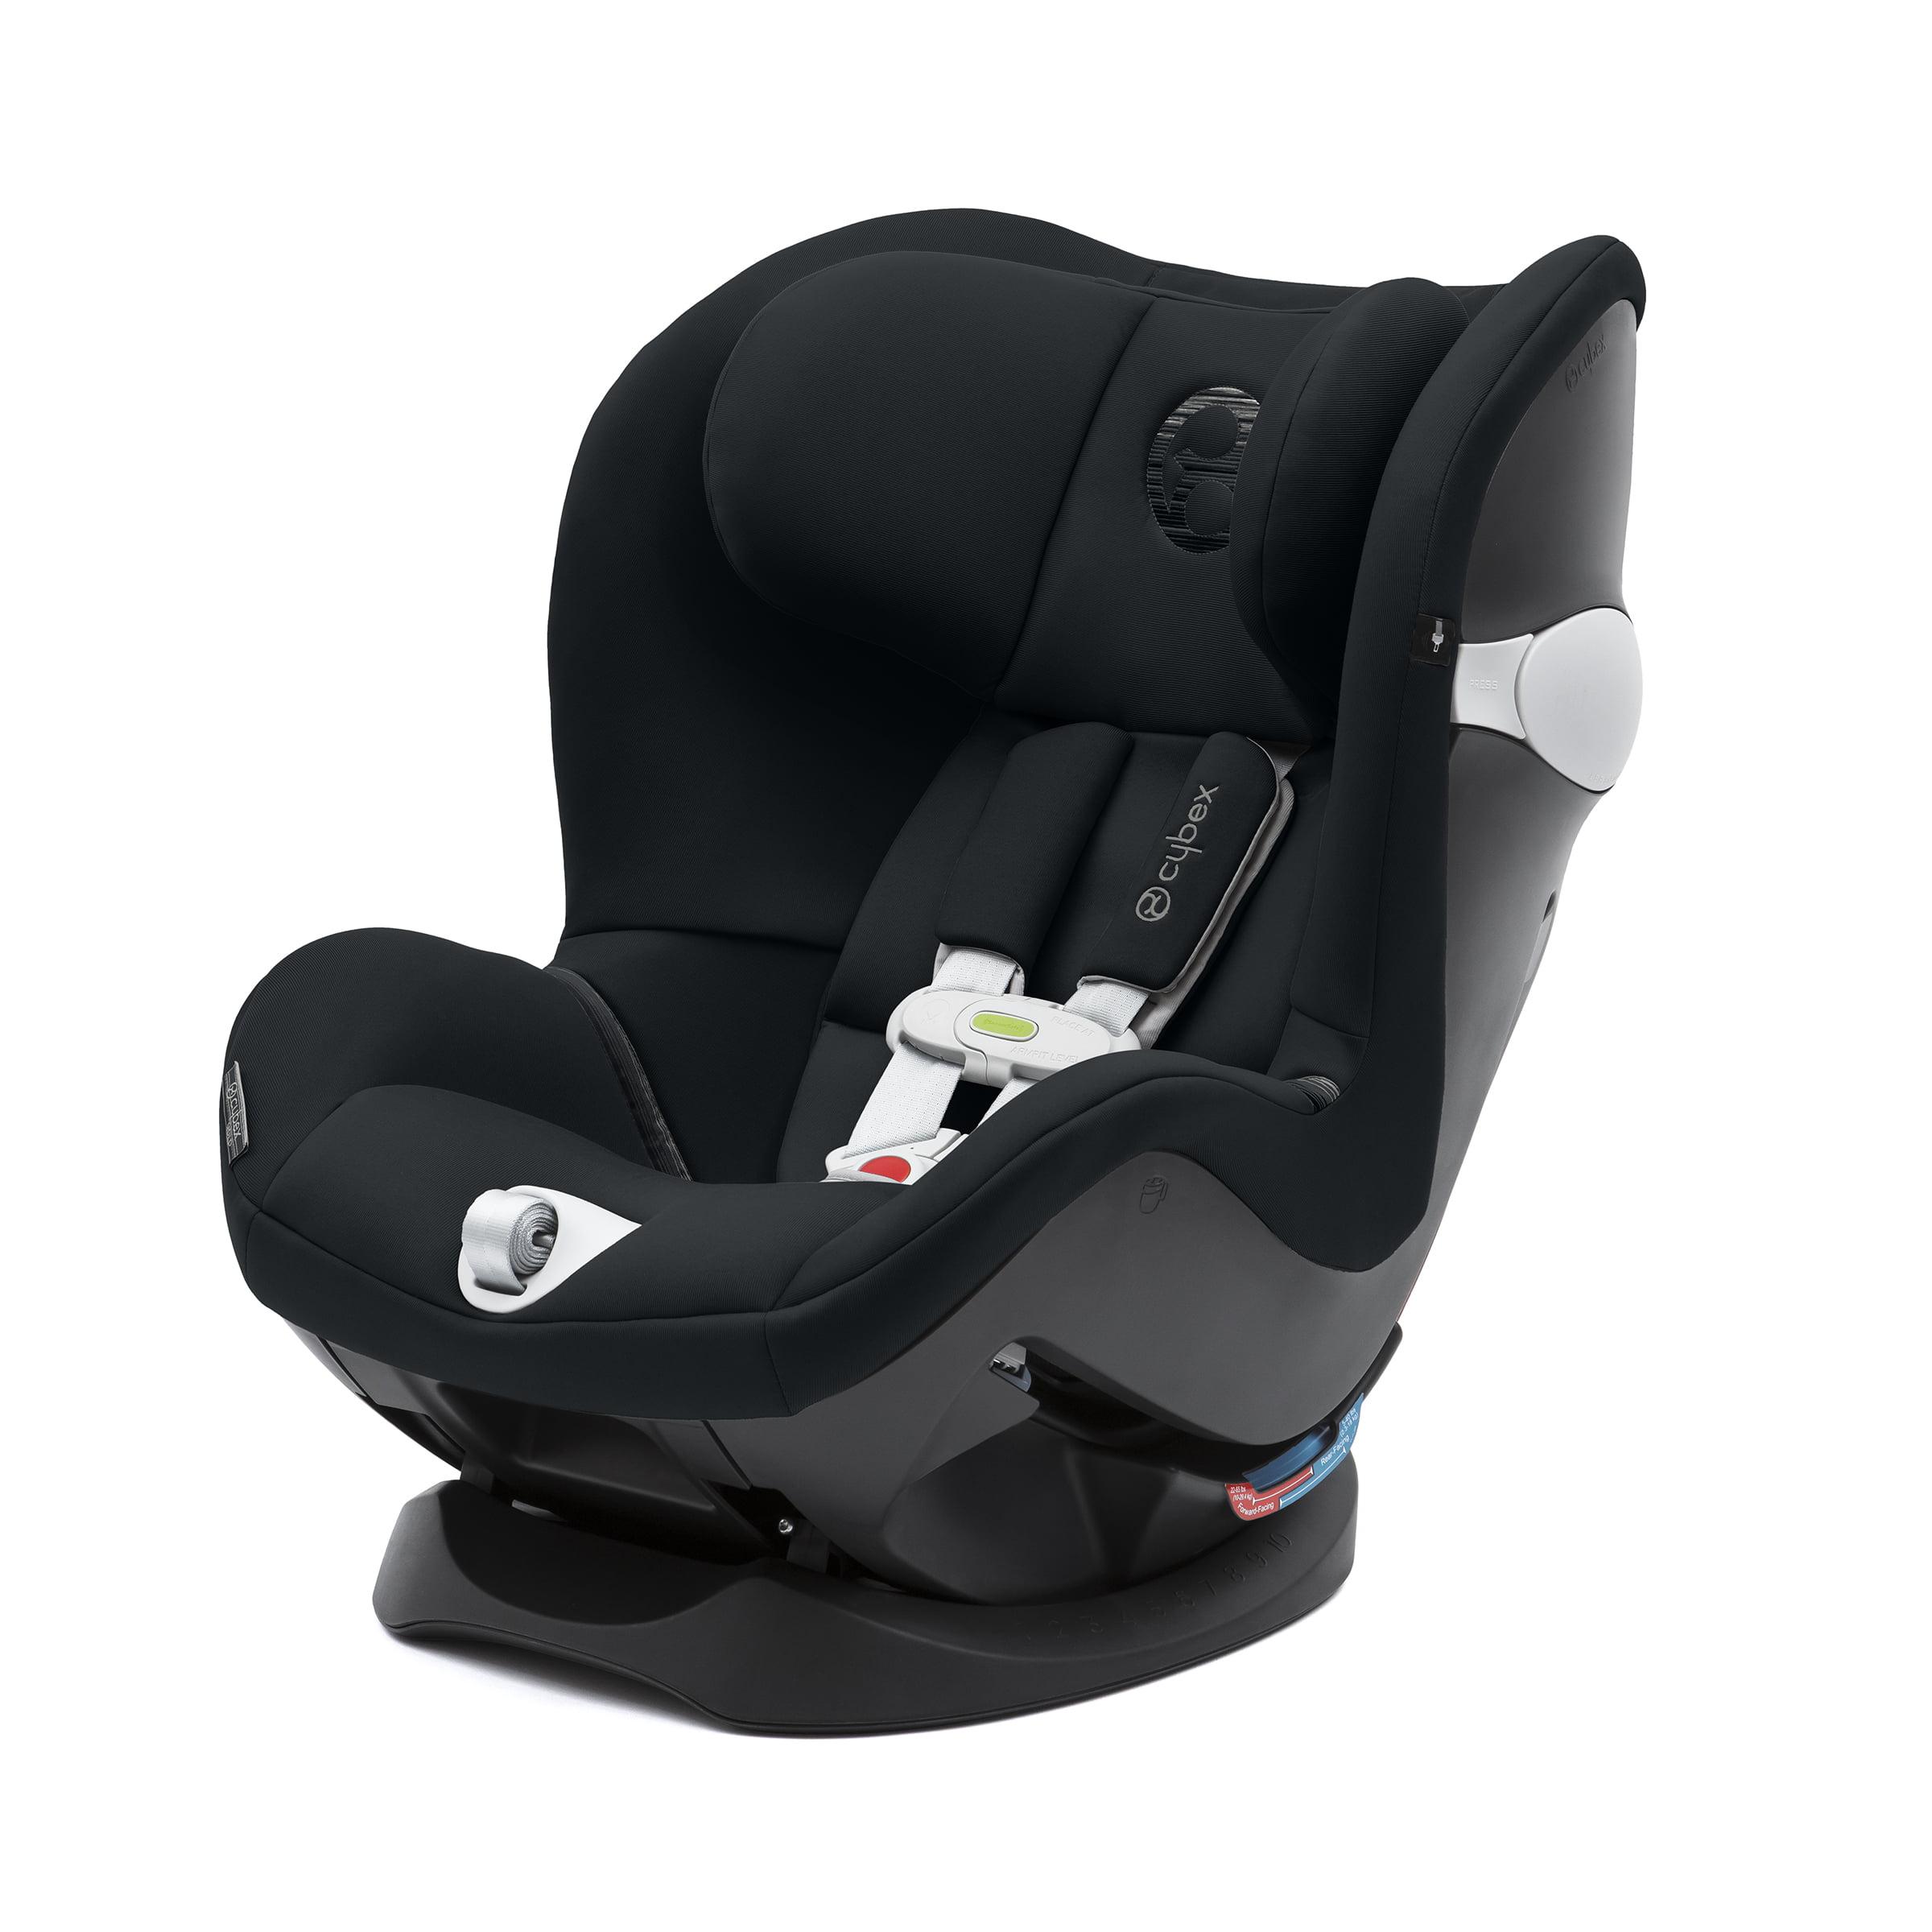 Cybex Sirona M Sensorsafe Convertible Car Seat, Lavastone Black by Cybex